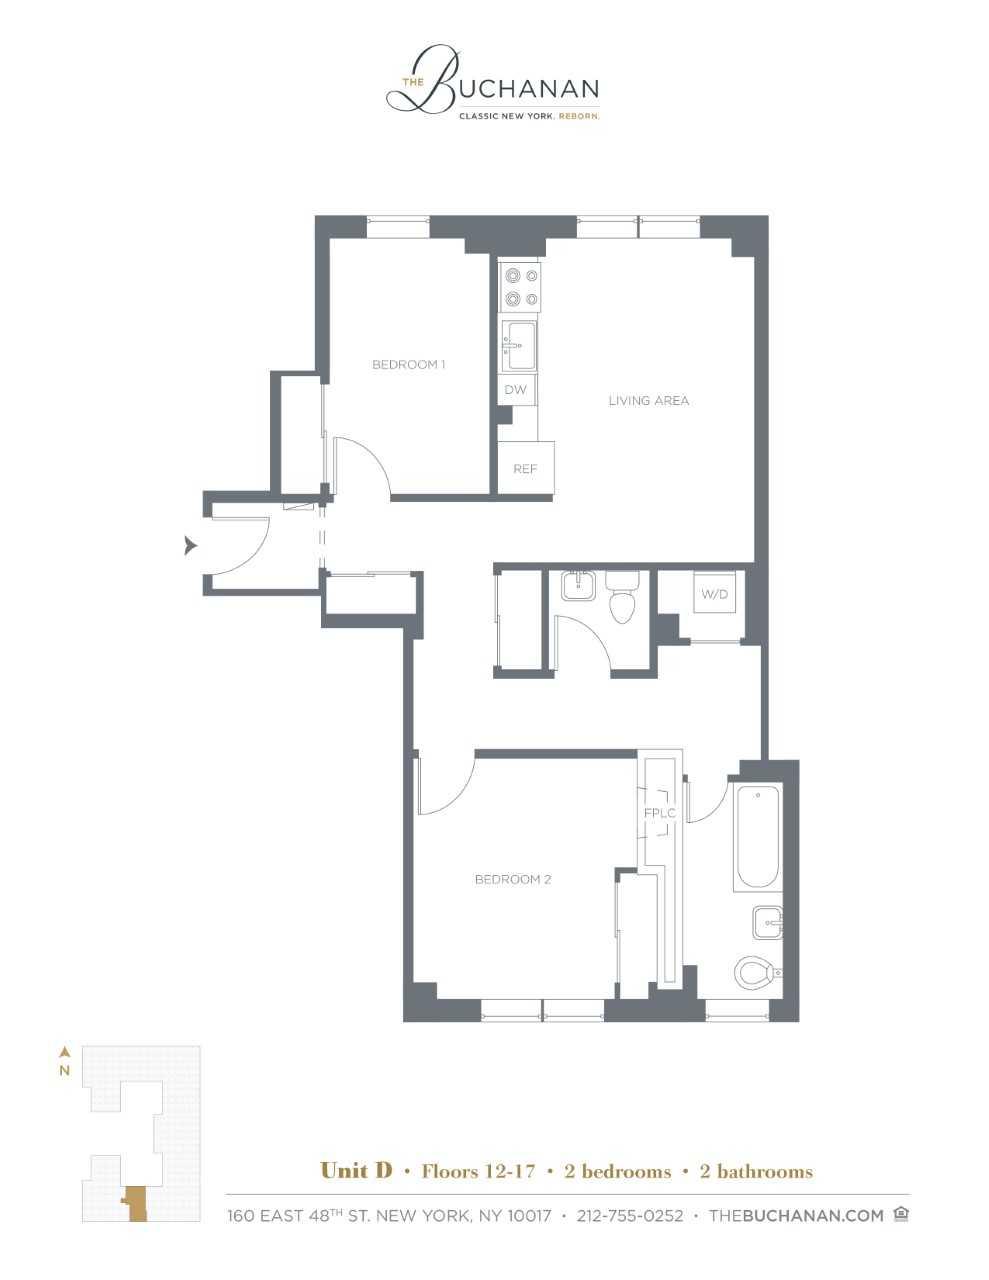 Floor plan for 15R